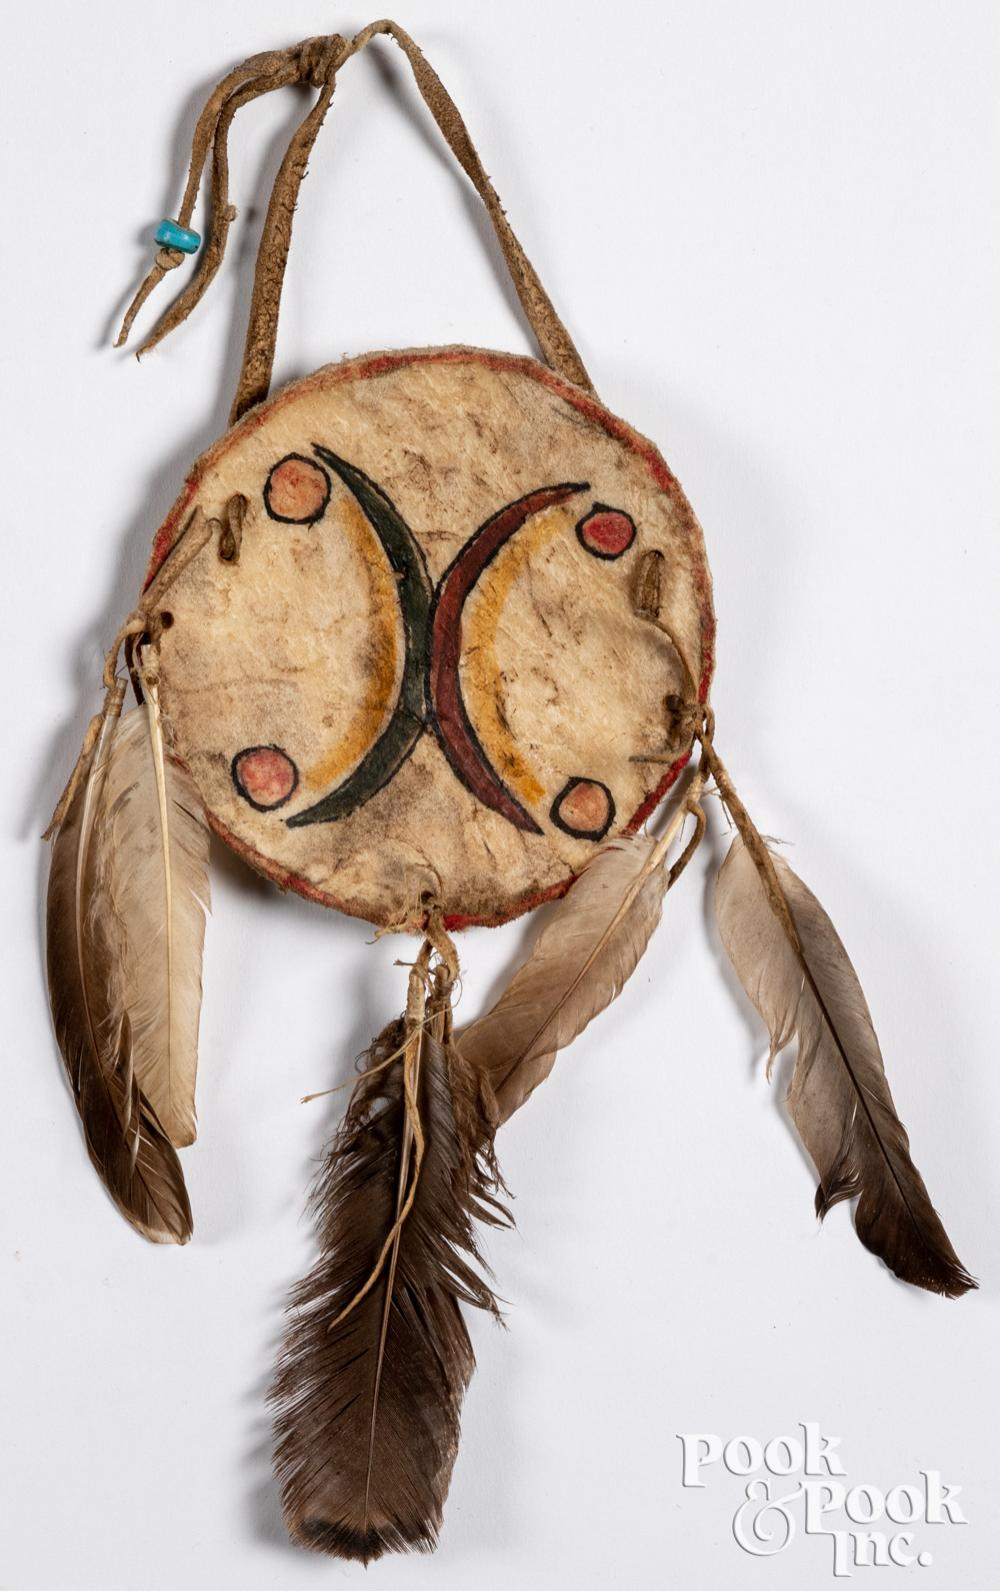 Native American Indian parfleche dreamcatcher